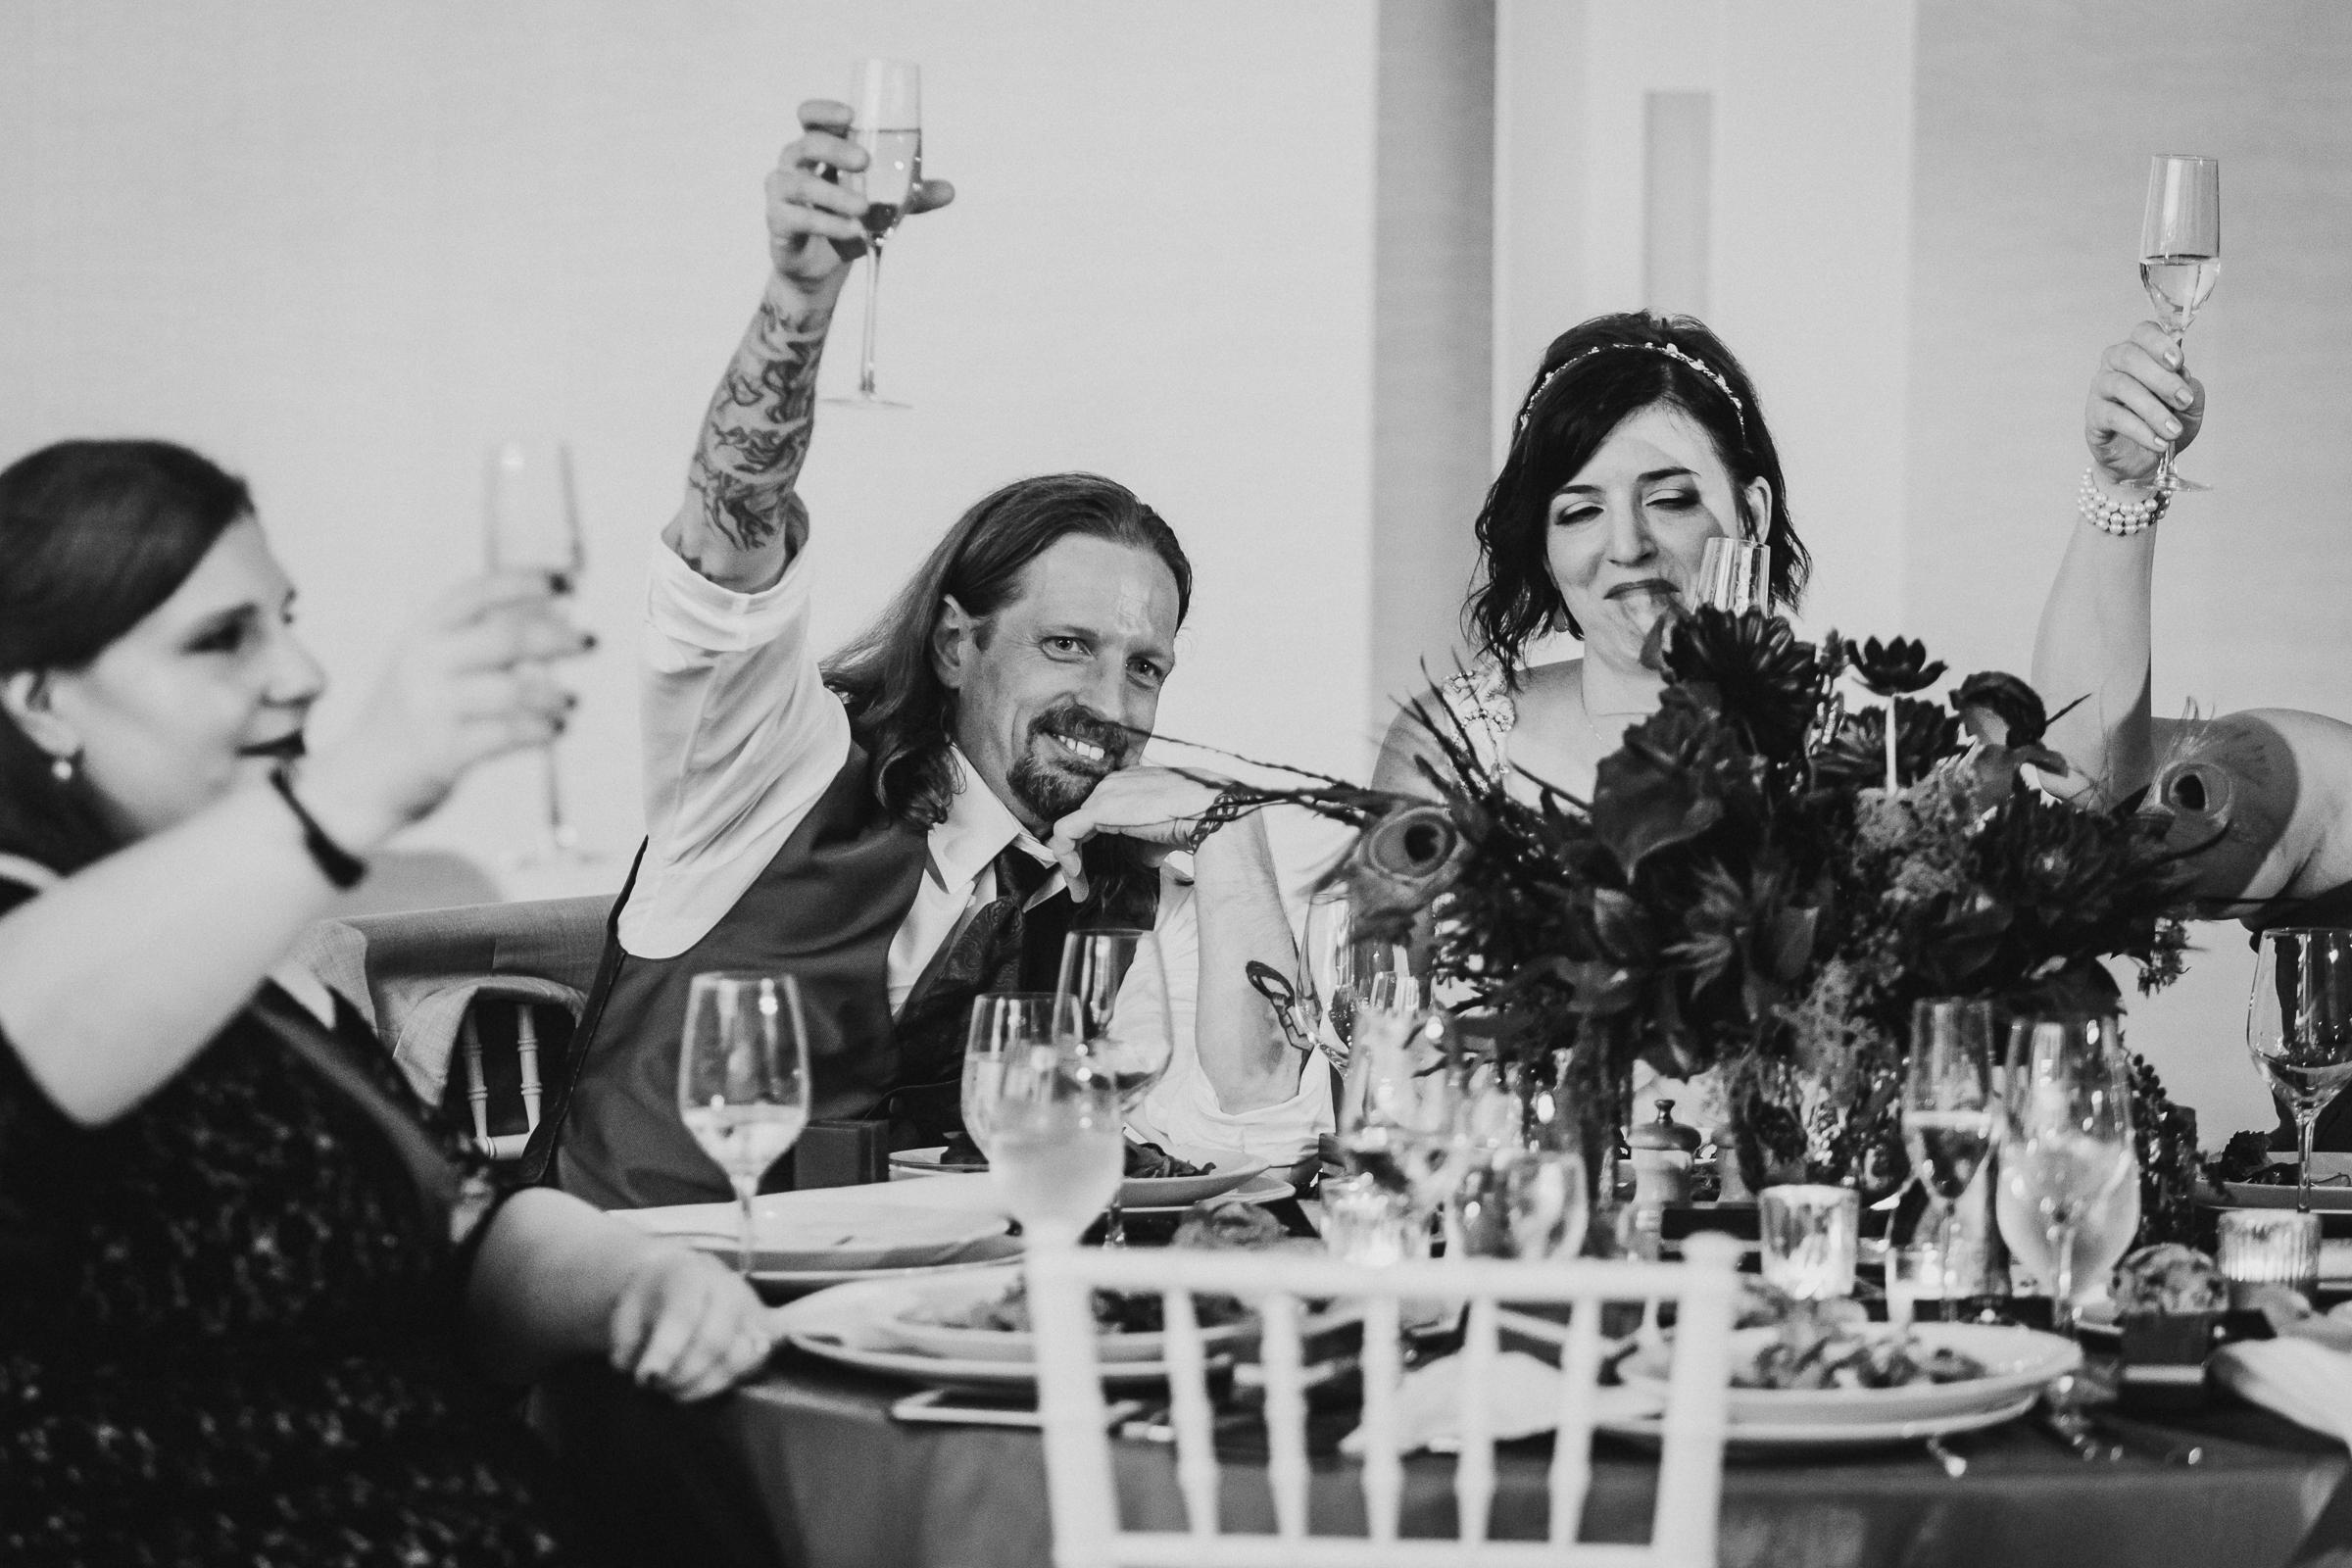 NYC-Brooklyn-Hotel-1-Botanic-Garden-Documentary-Wedding-Photographer-76.jpg